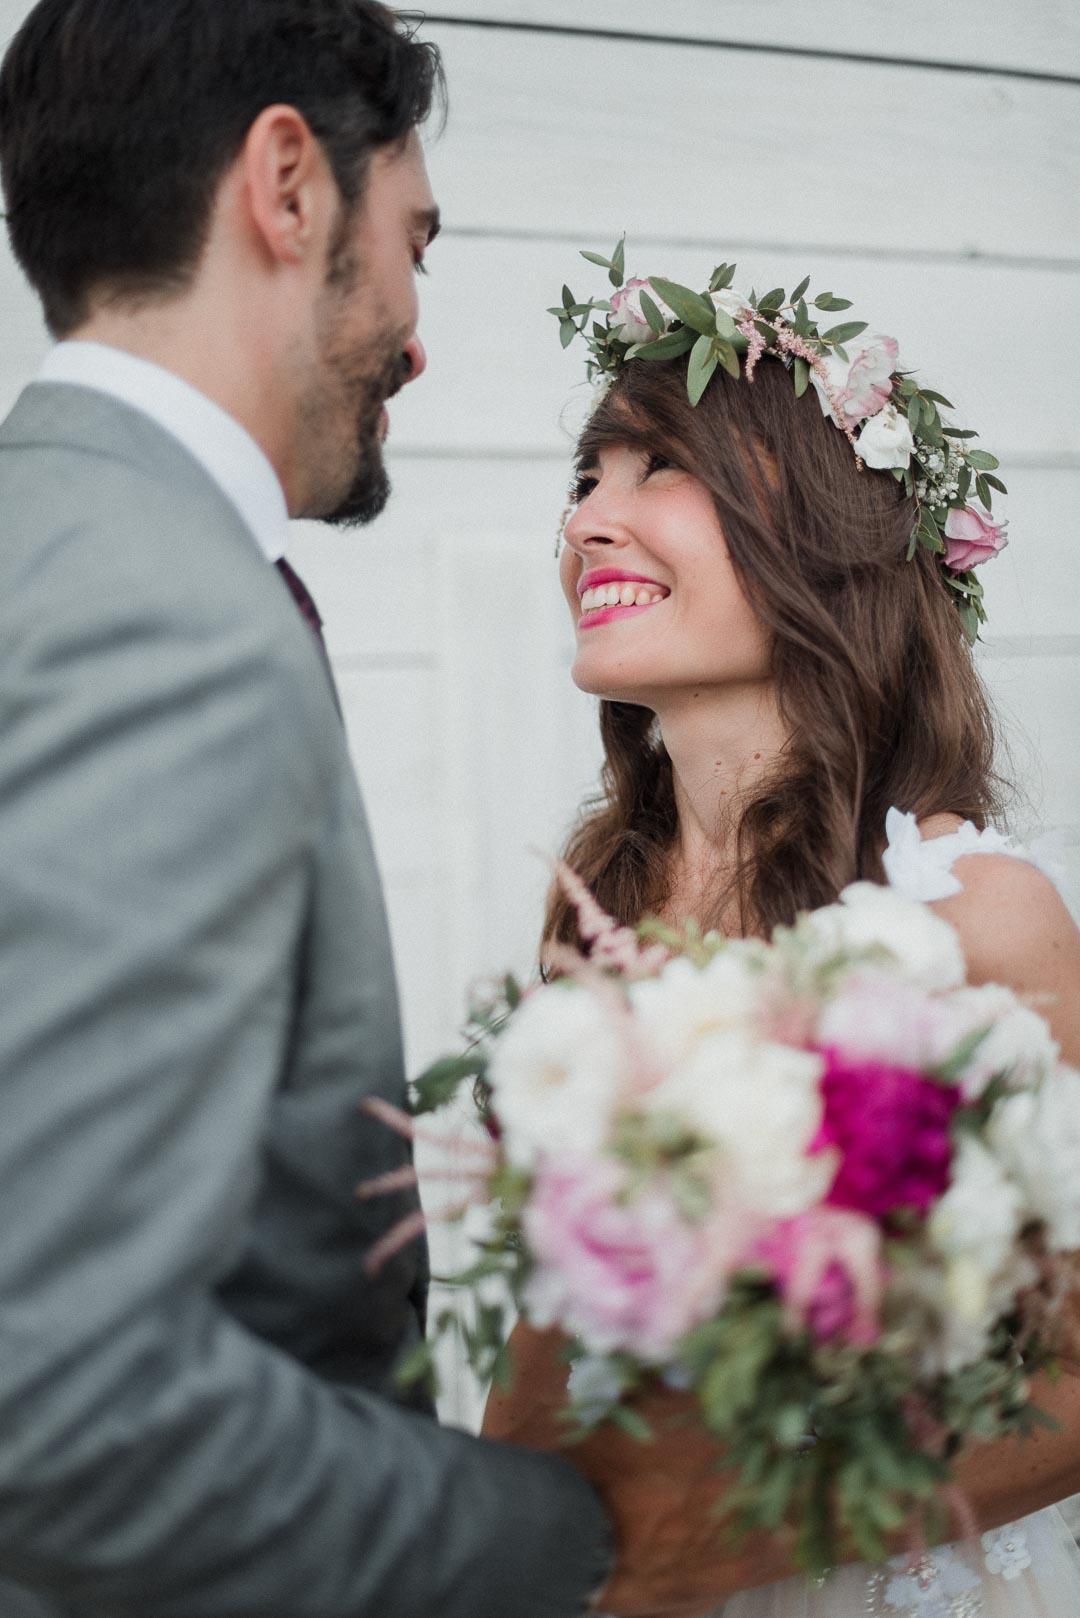 wedding-photographer-destination-fineart-bespoke-reportage-amalficoast-torrelacerniola-vivianeizzo-spazio46-68